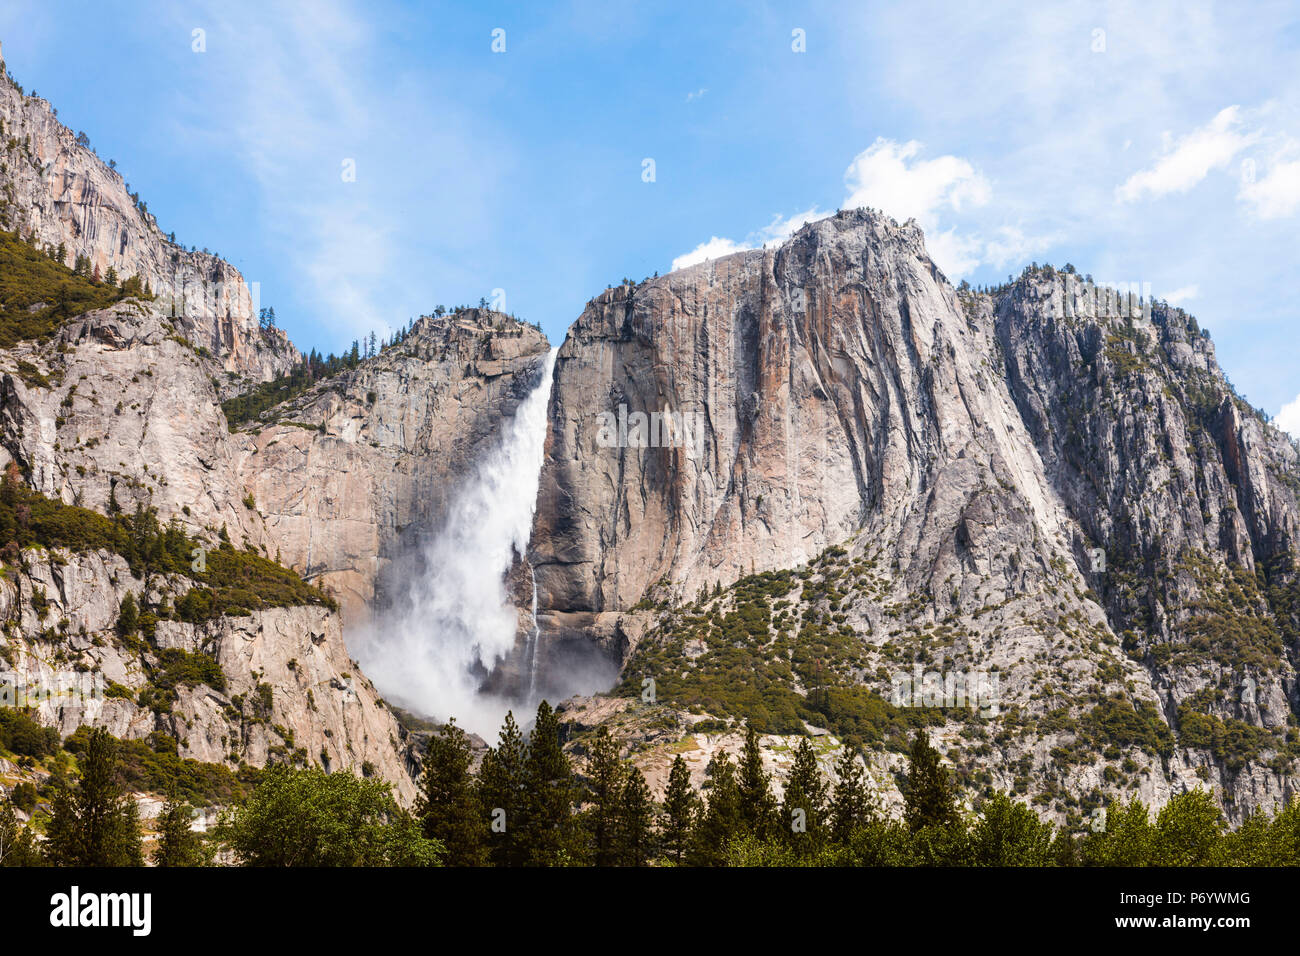 Upper Yosemite fall, Yosemite National Park, California, USA - Stock Image